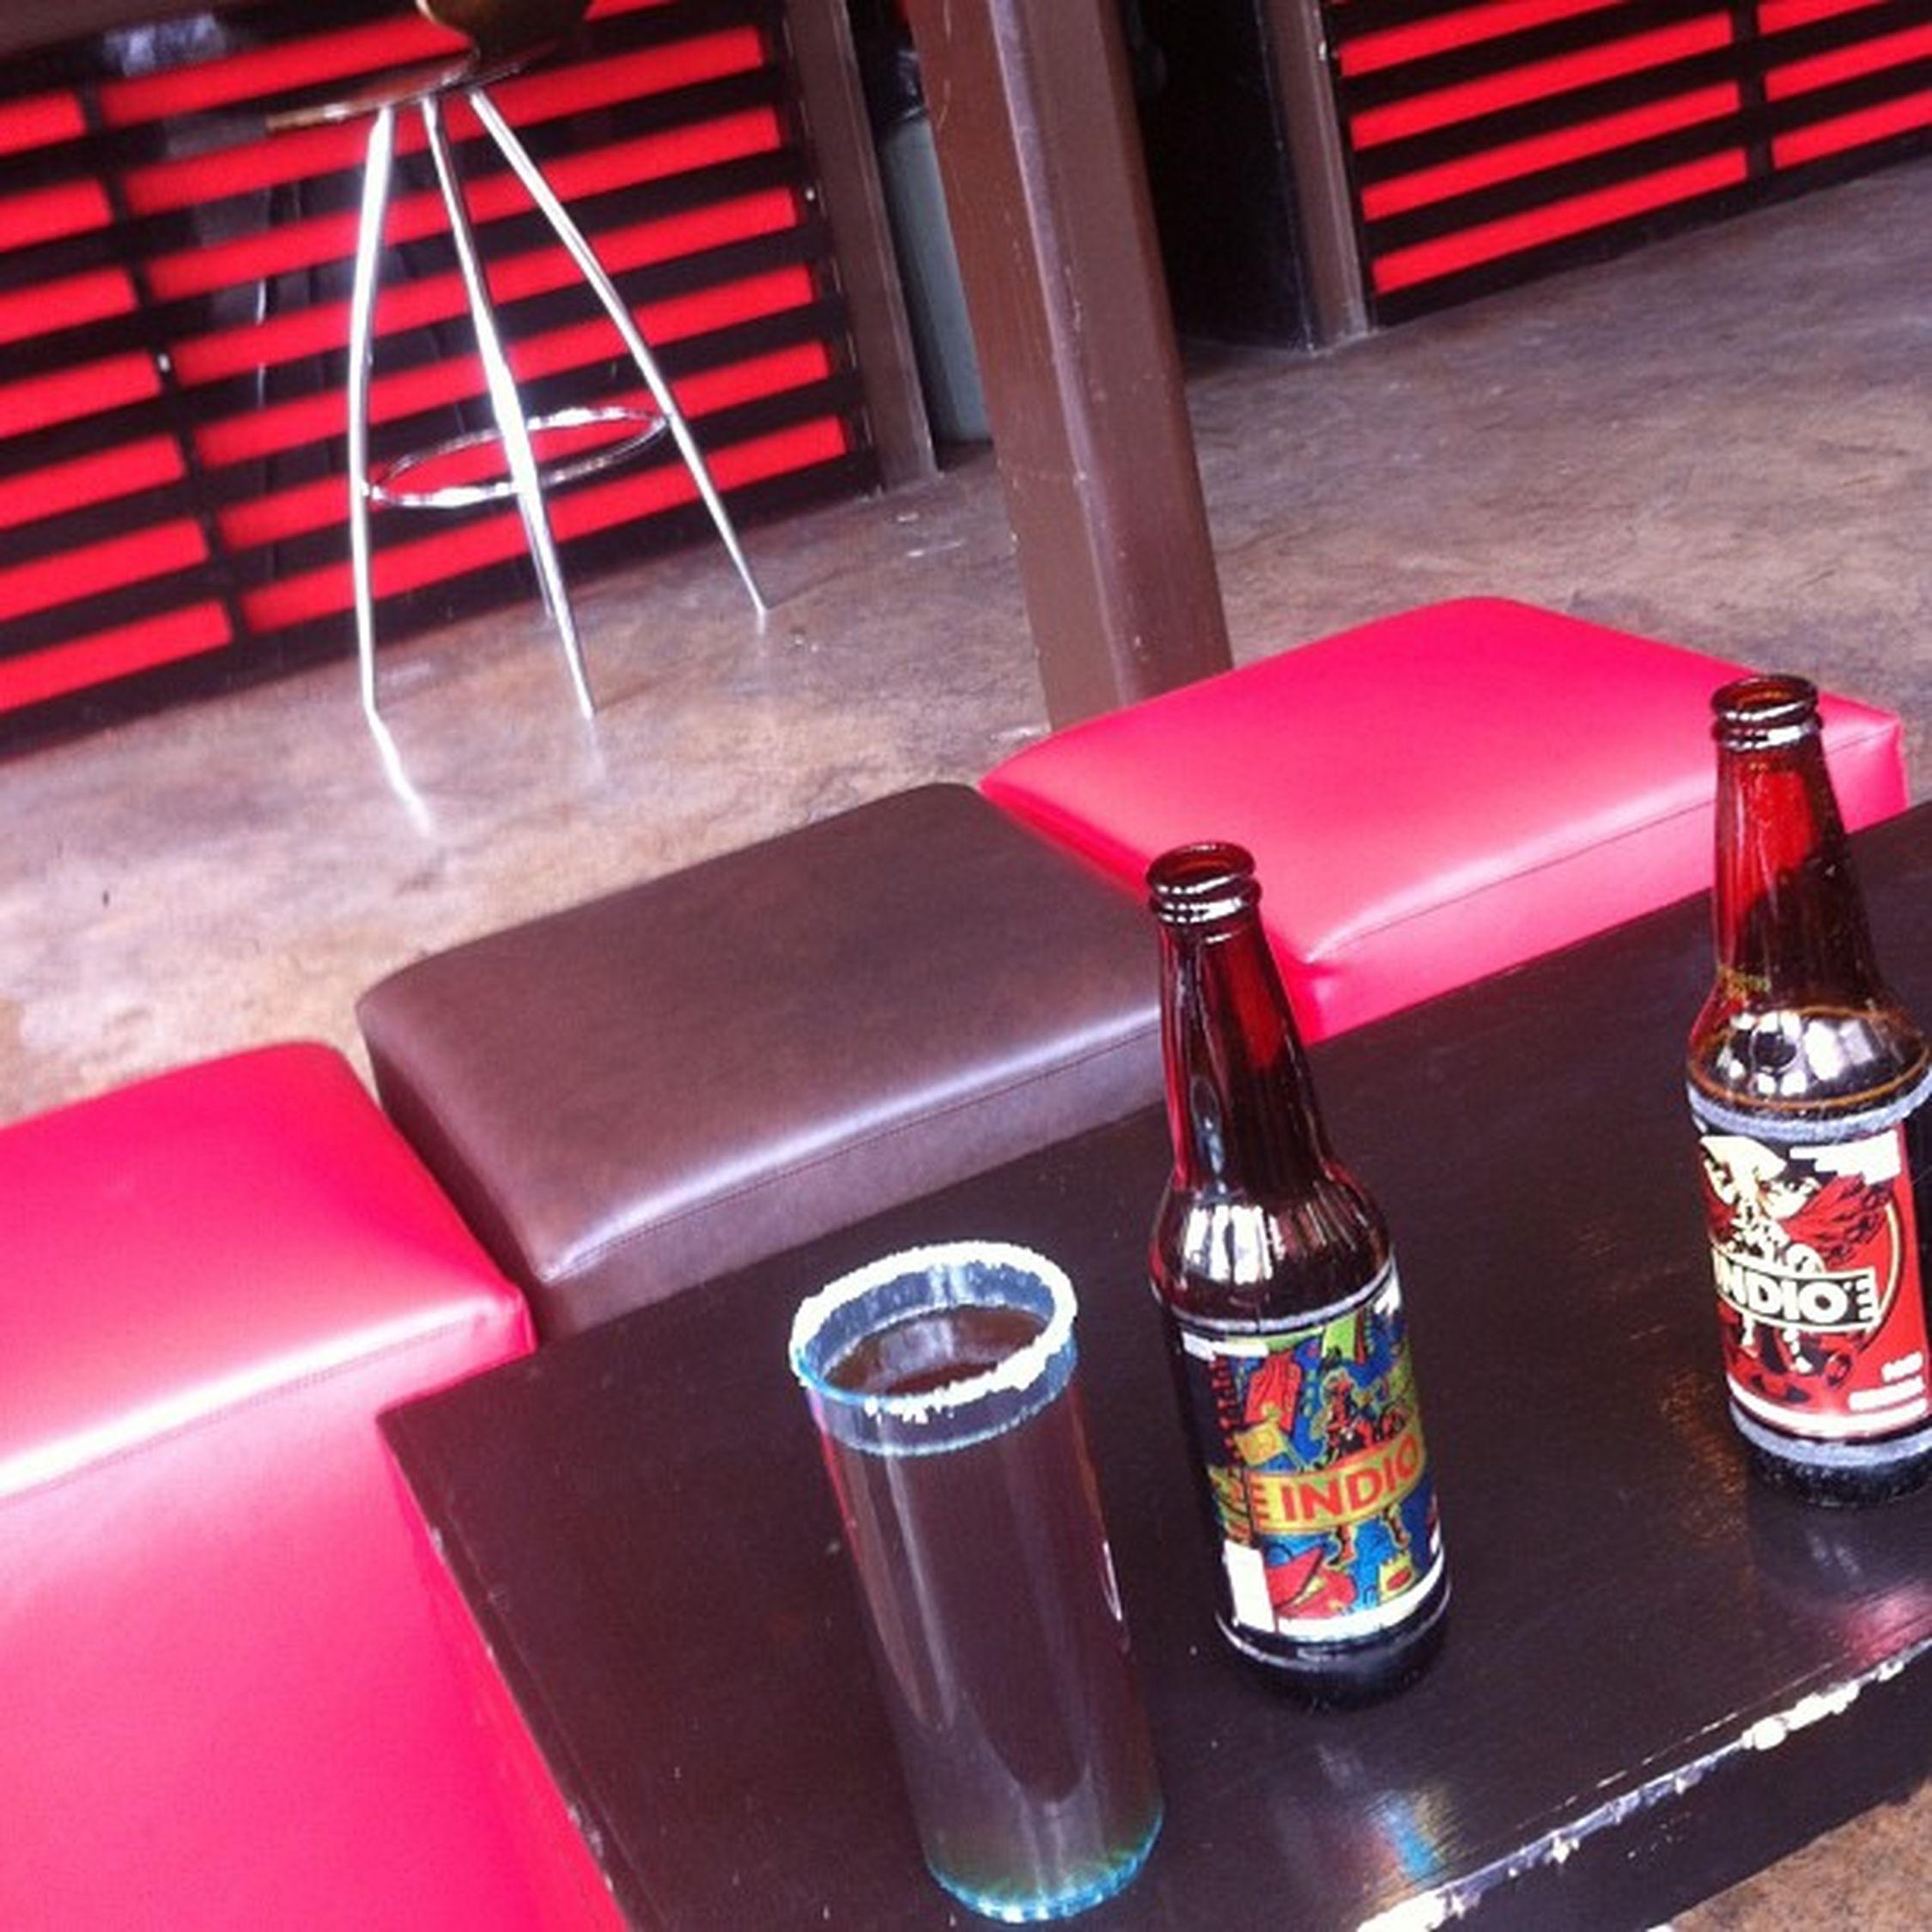 Aguayo Supercopa España InDiO Beer ligabbva copa barca atletico madrid mexico monterrey previa rayados